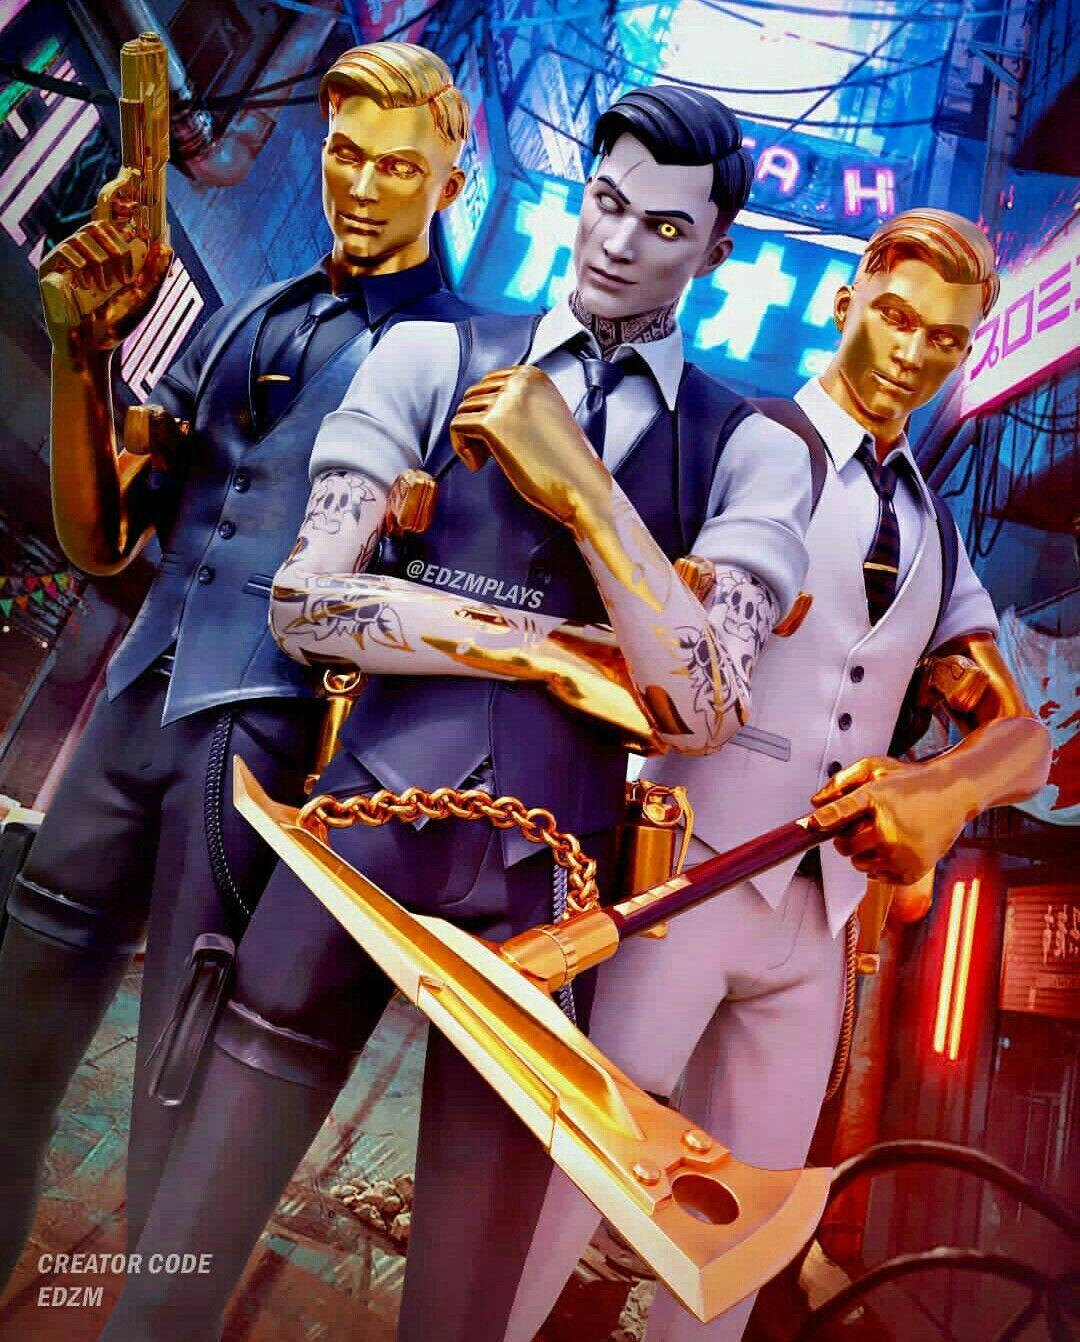 Midas Fortnite Chapter 2 Season2 In 2020 Best Gaming Wallpapers Deadpool Wallpaper Gaming Wallpapers